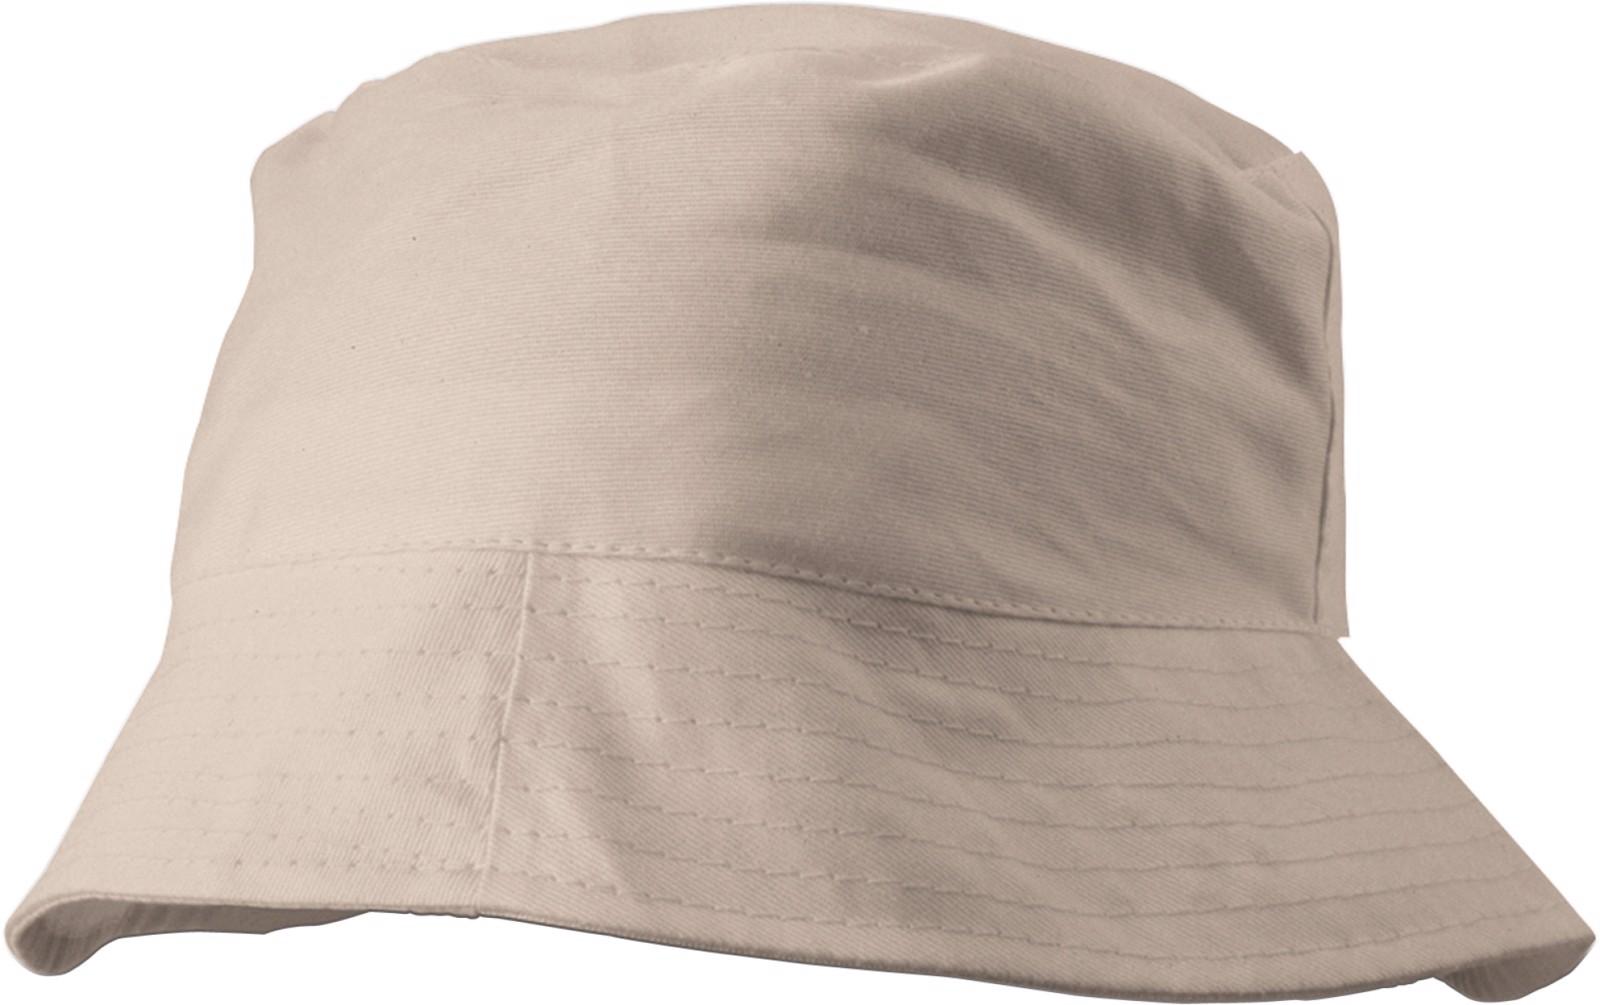 Cotton sun hat - Khaki